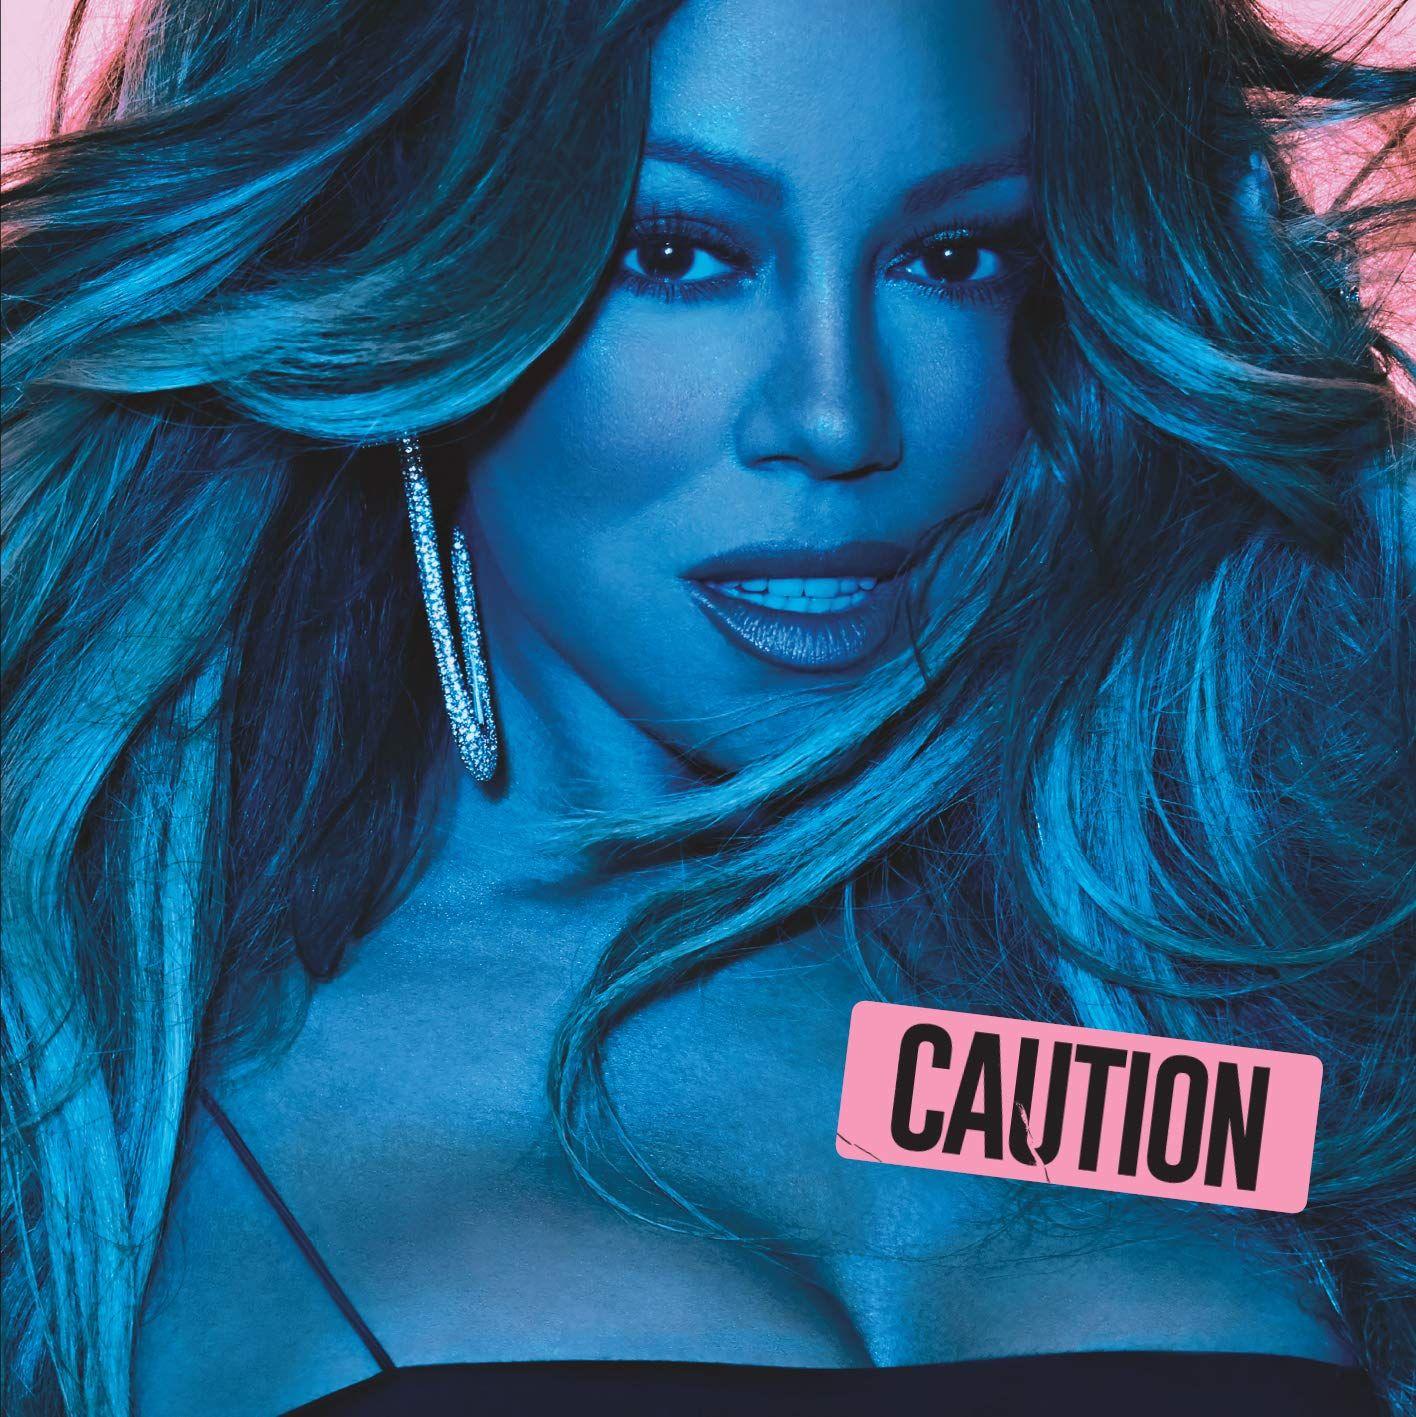 Caution Mariah Carey Caution Mariah Carey Mariah Carey Mariah Ty Dolla Ign